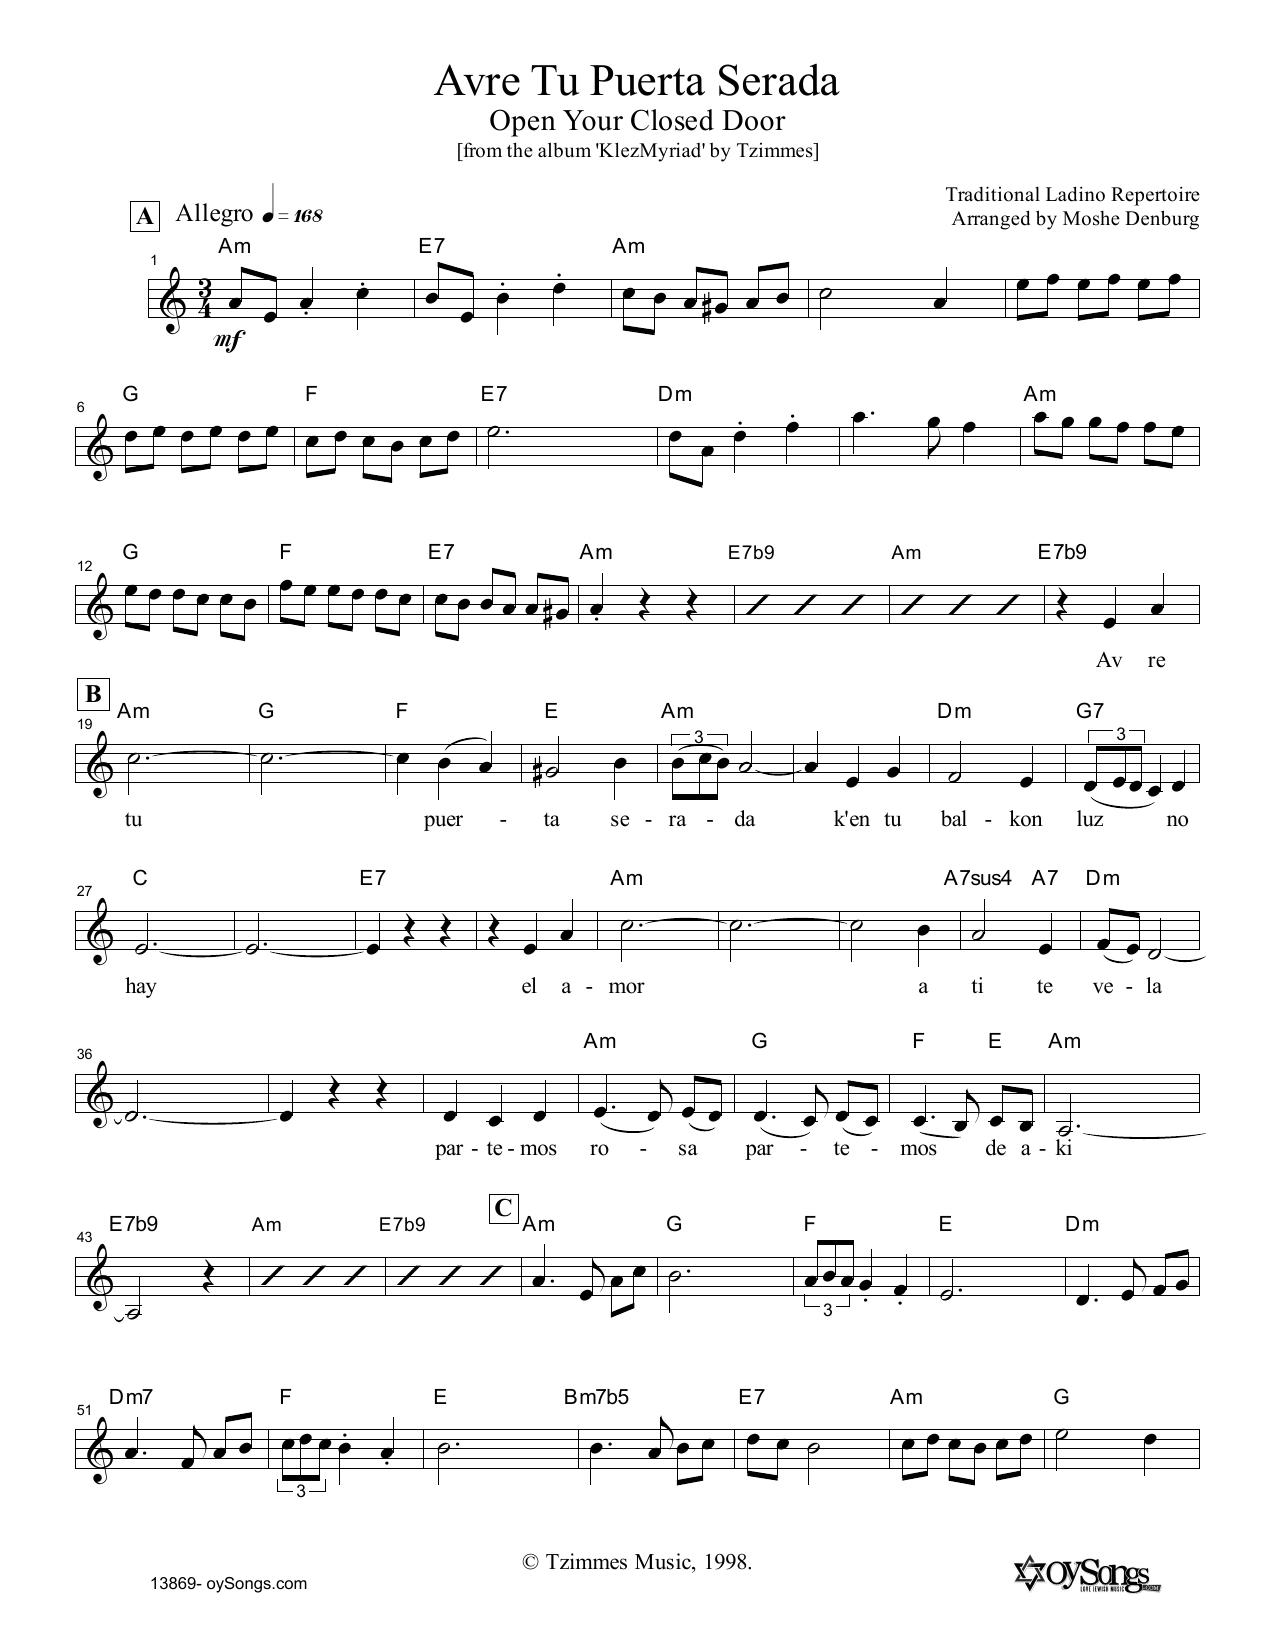 Moshe Denburg Avre Tu Puerta Serada sheet music notes and chords. Download Printable PDF.